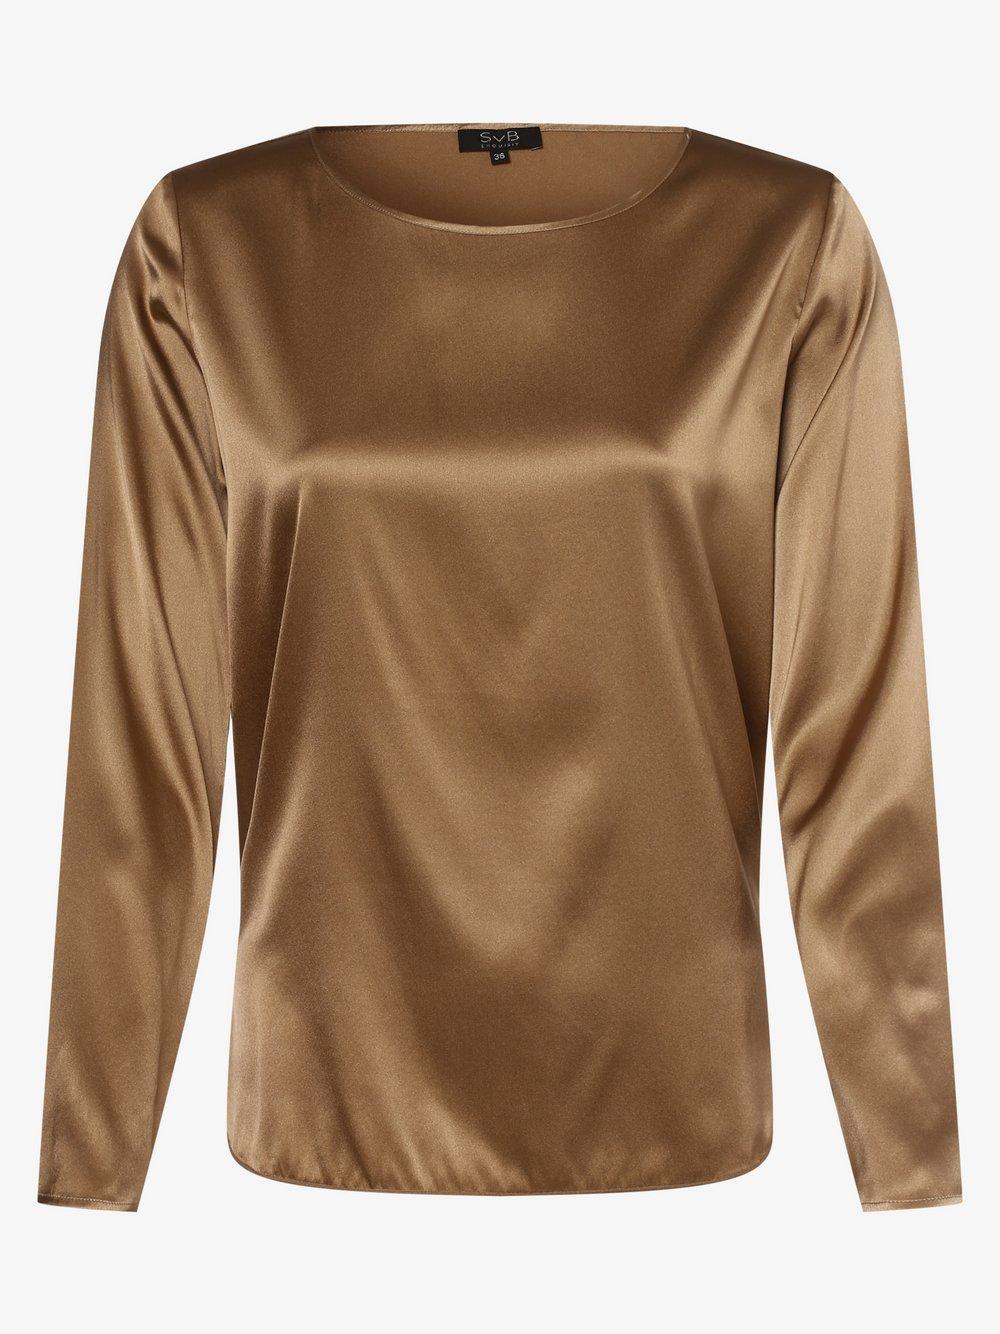 SvB Exquisit – Bluzka damska, beżowy Van Graaf 479056-0001